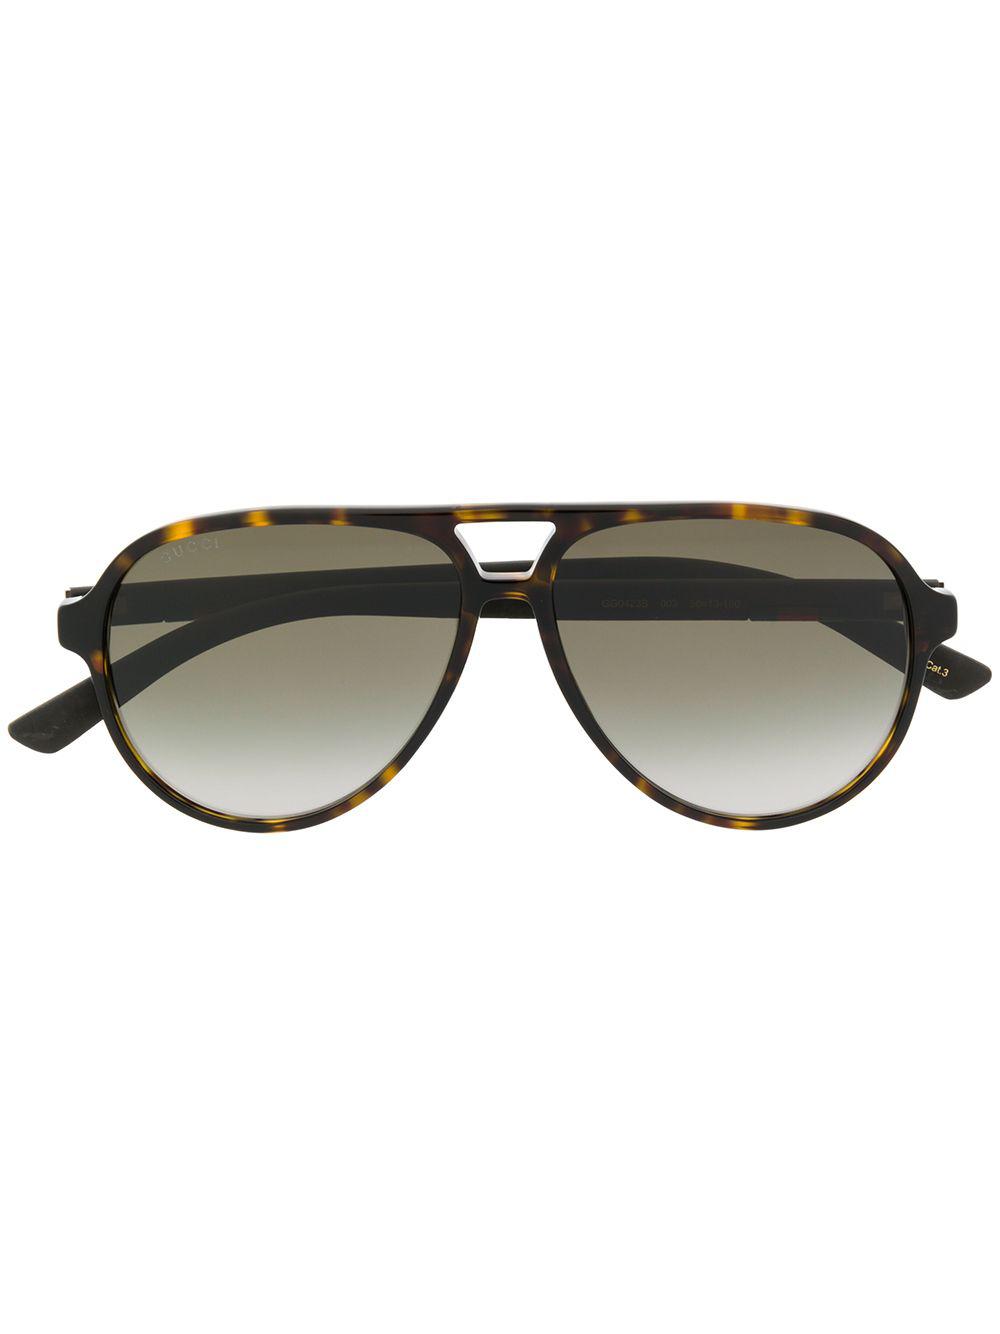 e83d5685d0b Gucci Eyewear Tortoiseshell-Effect Aviator Sunglasses - Brown